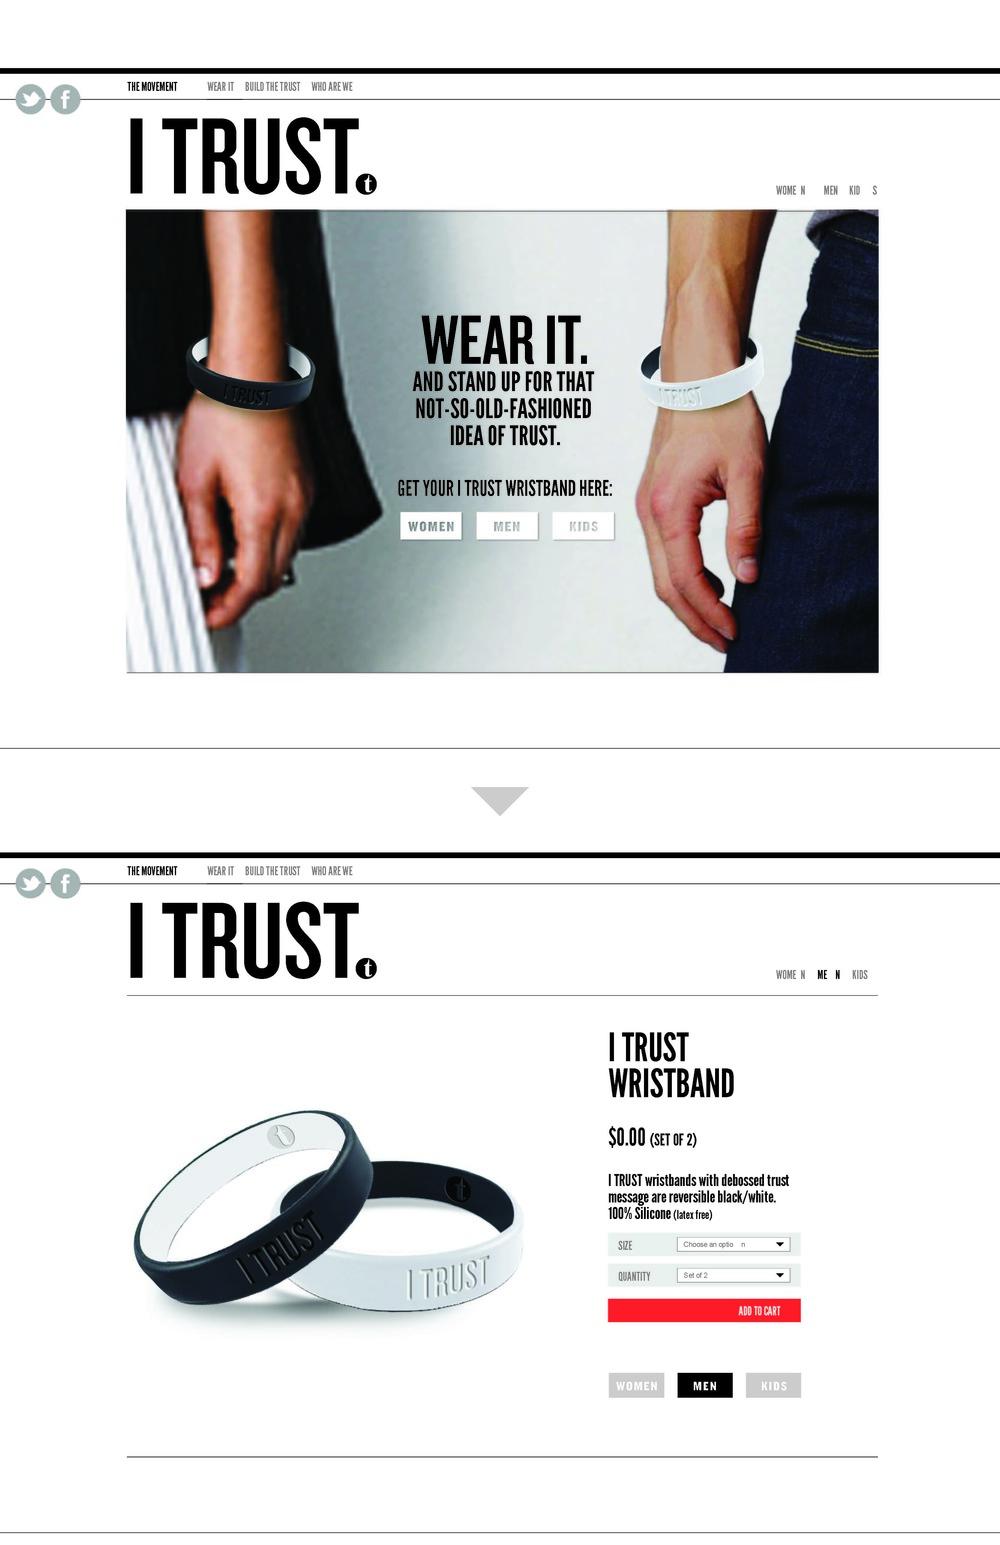 I_Trust_1019_Page_08.jpg